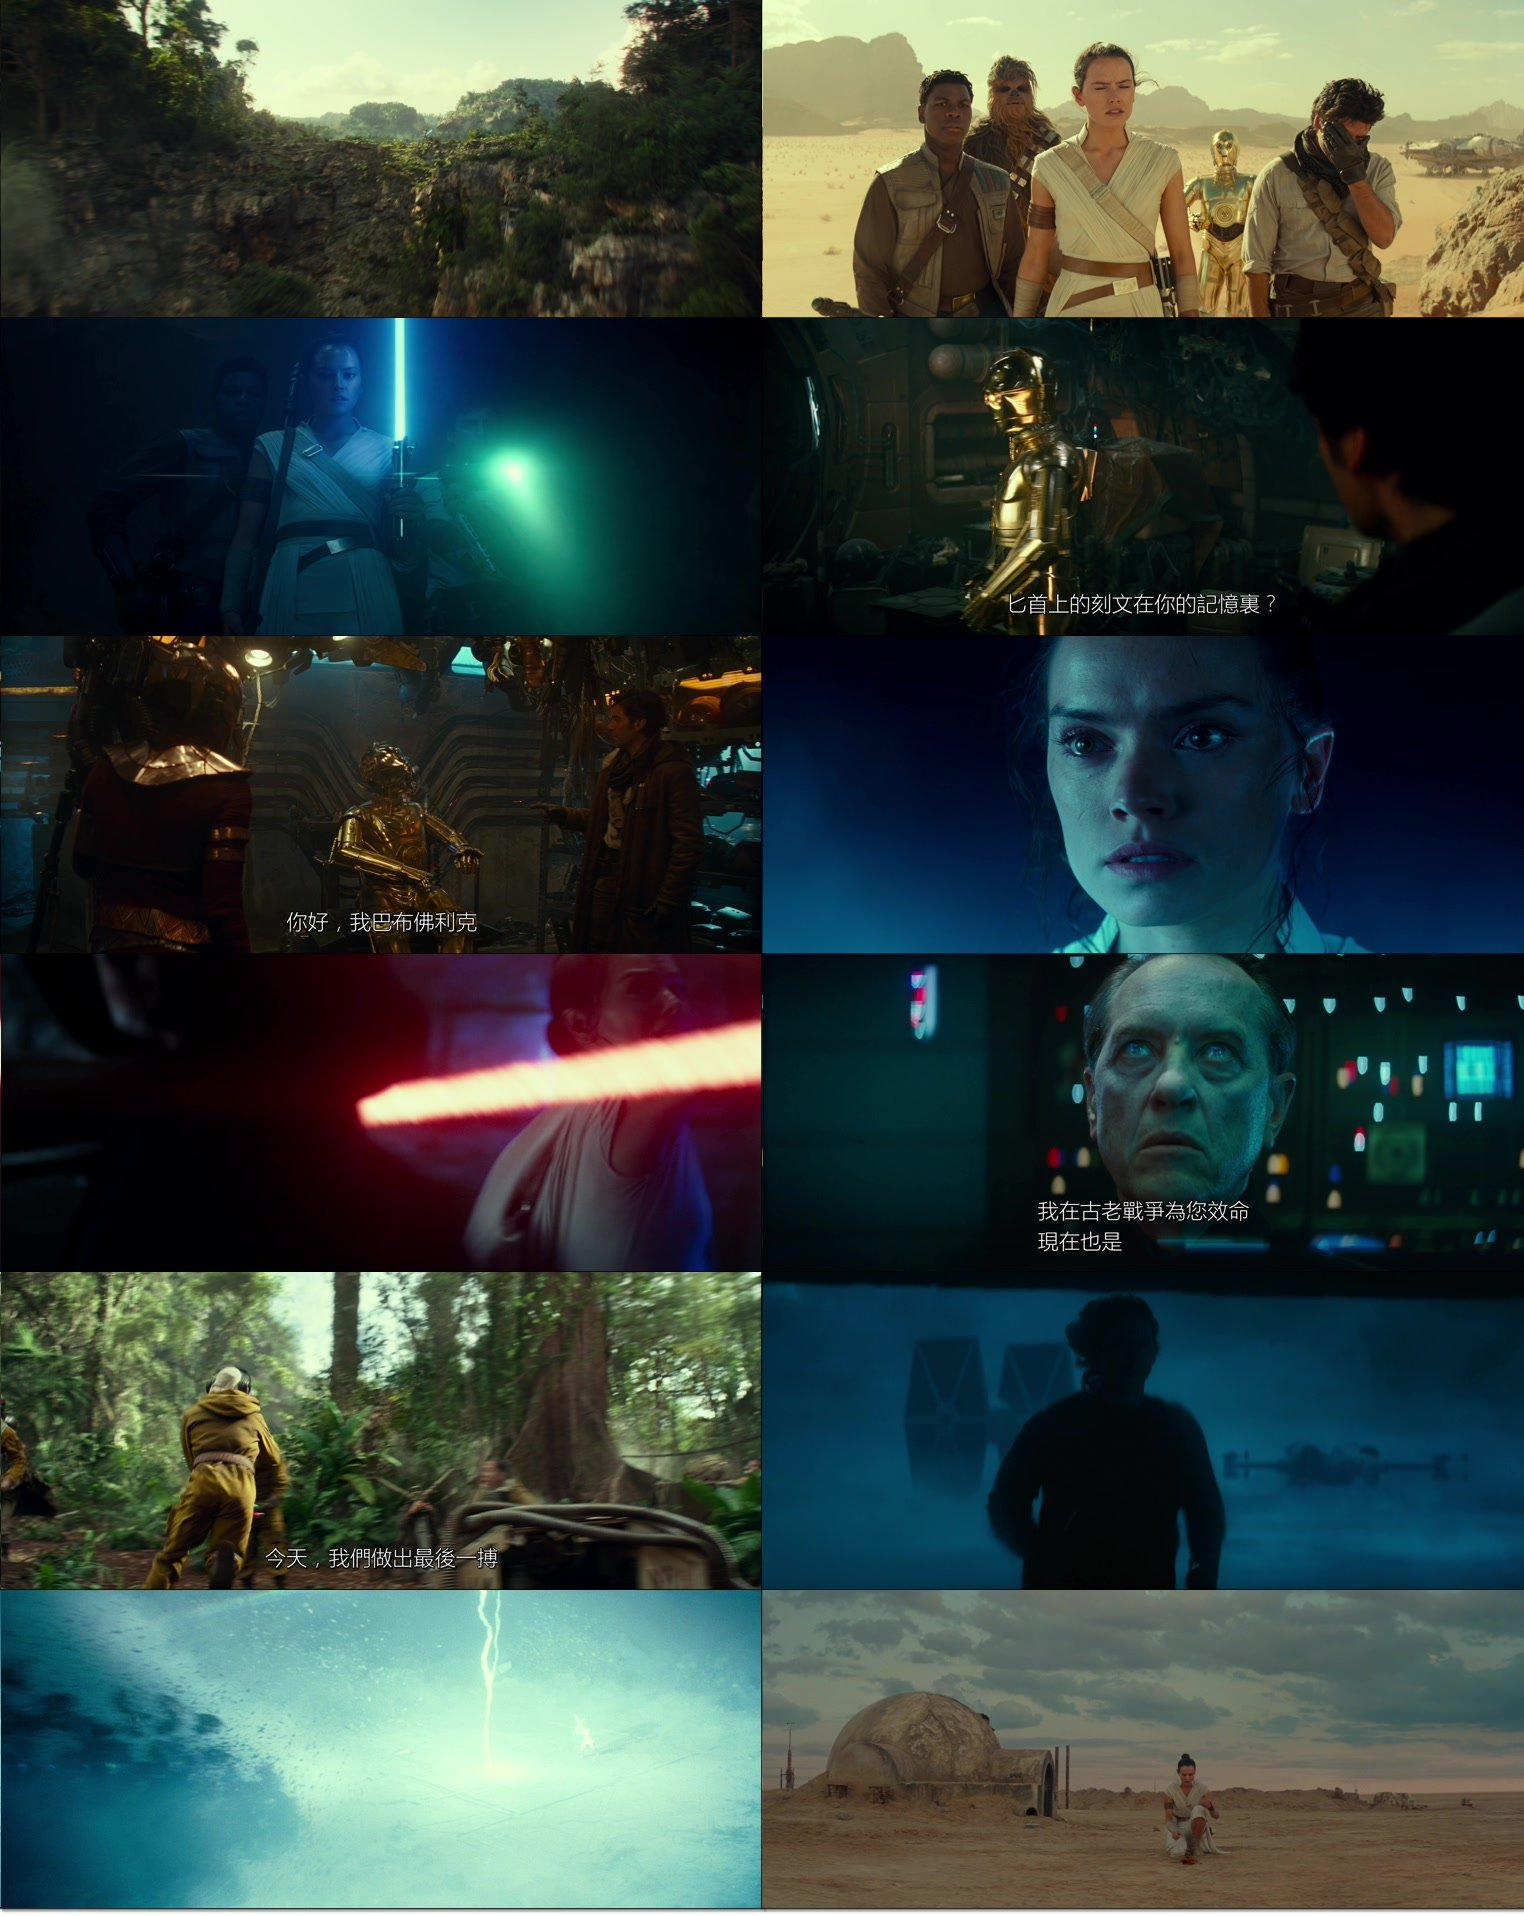 Star.Wars.Episode.IX.The.Rise.of.Skywalker.2019.1080p.BluRay.x264.DTS-CHD.mkv